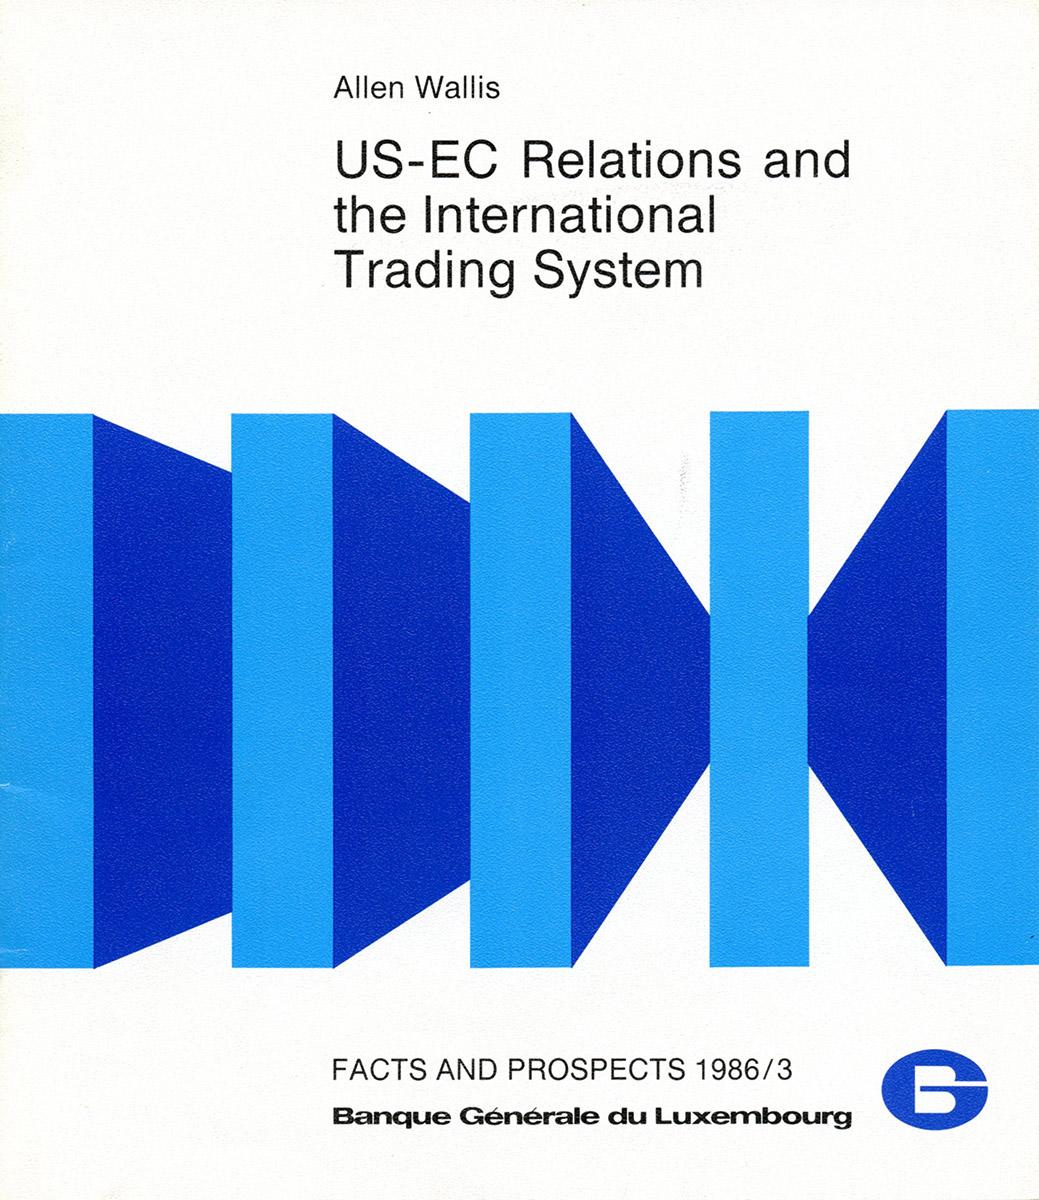 Dépliant US-EC Relations 1986 BGL Luxembourg Illustrations Pit Weyer